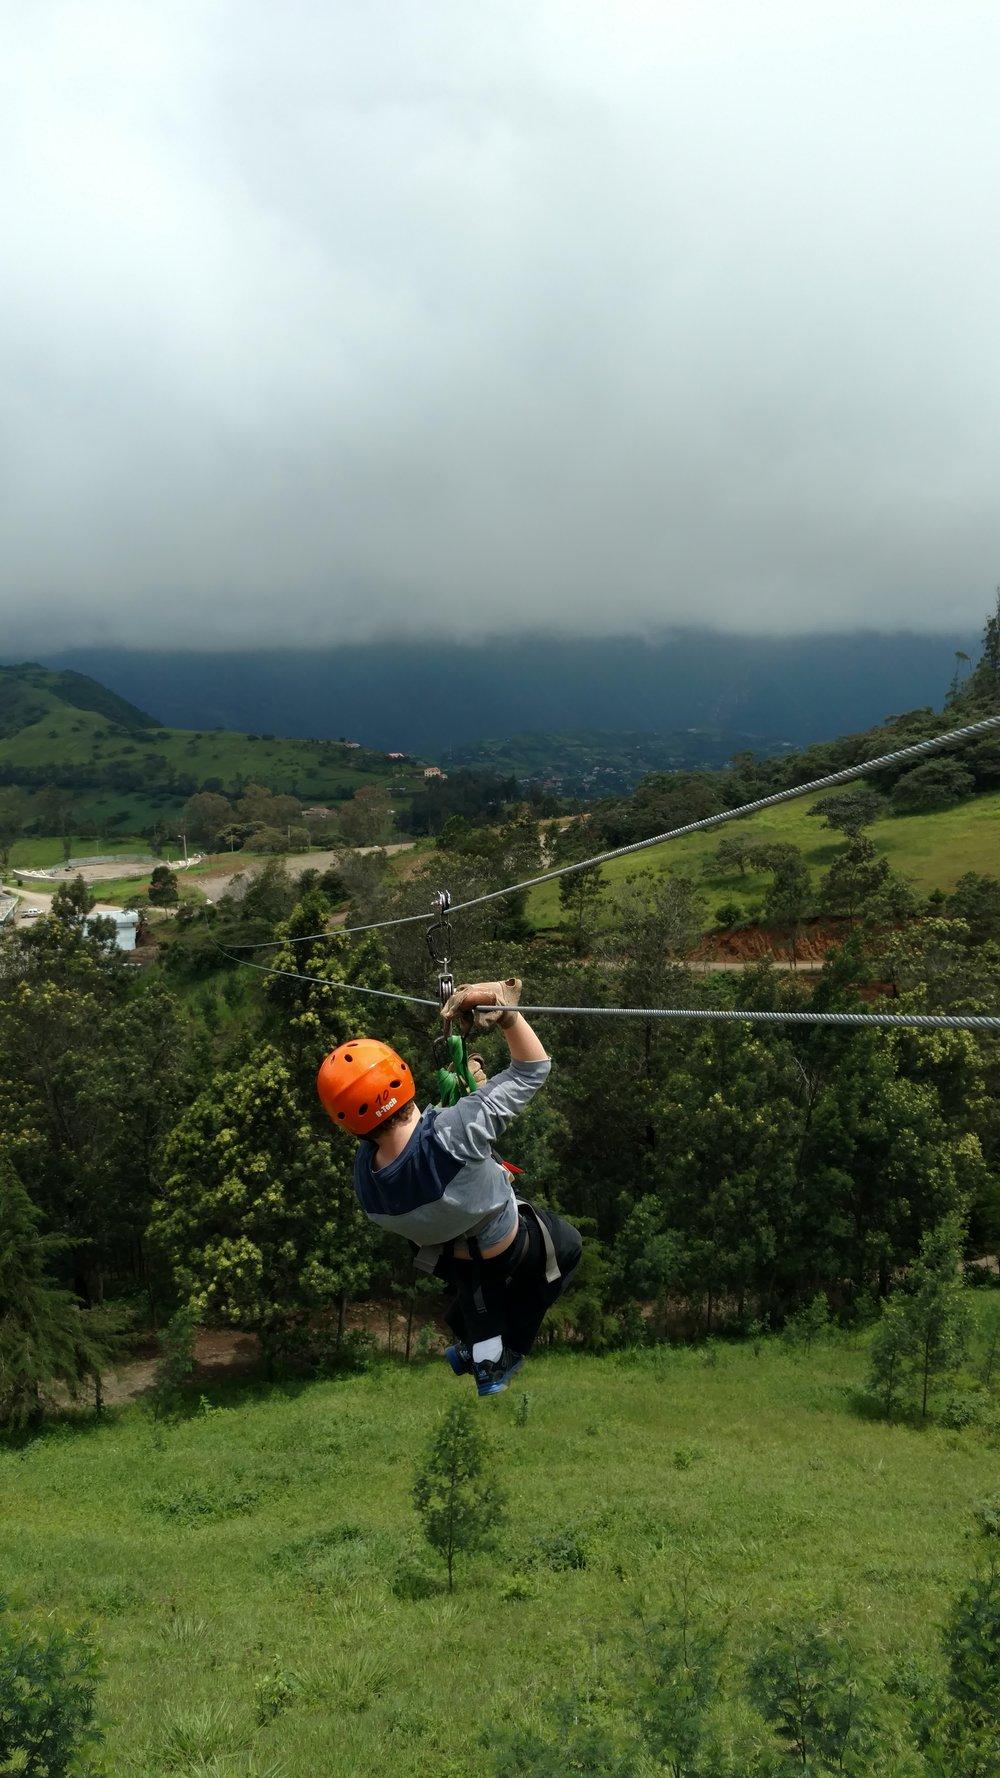 Ziplining in Ecuador